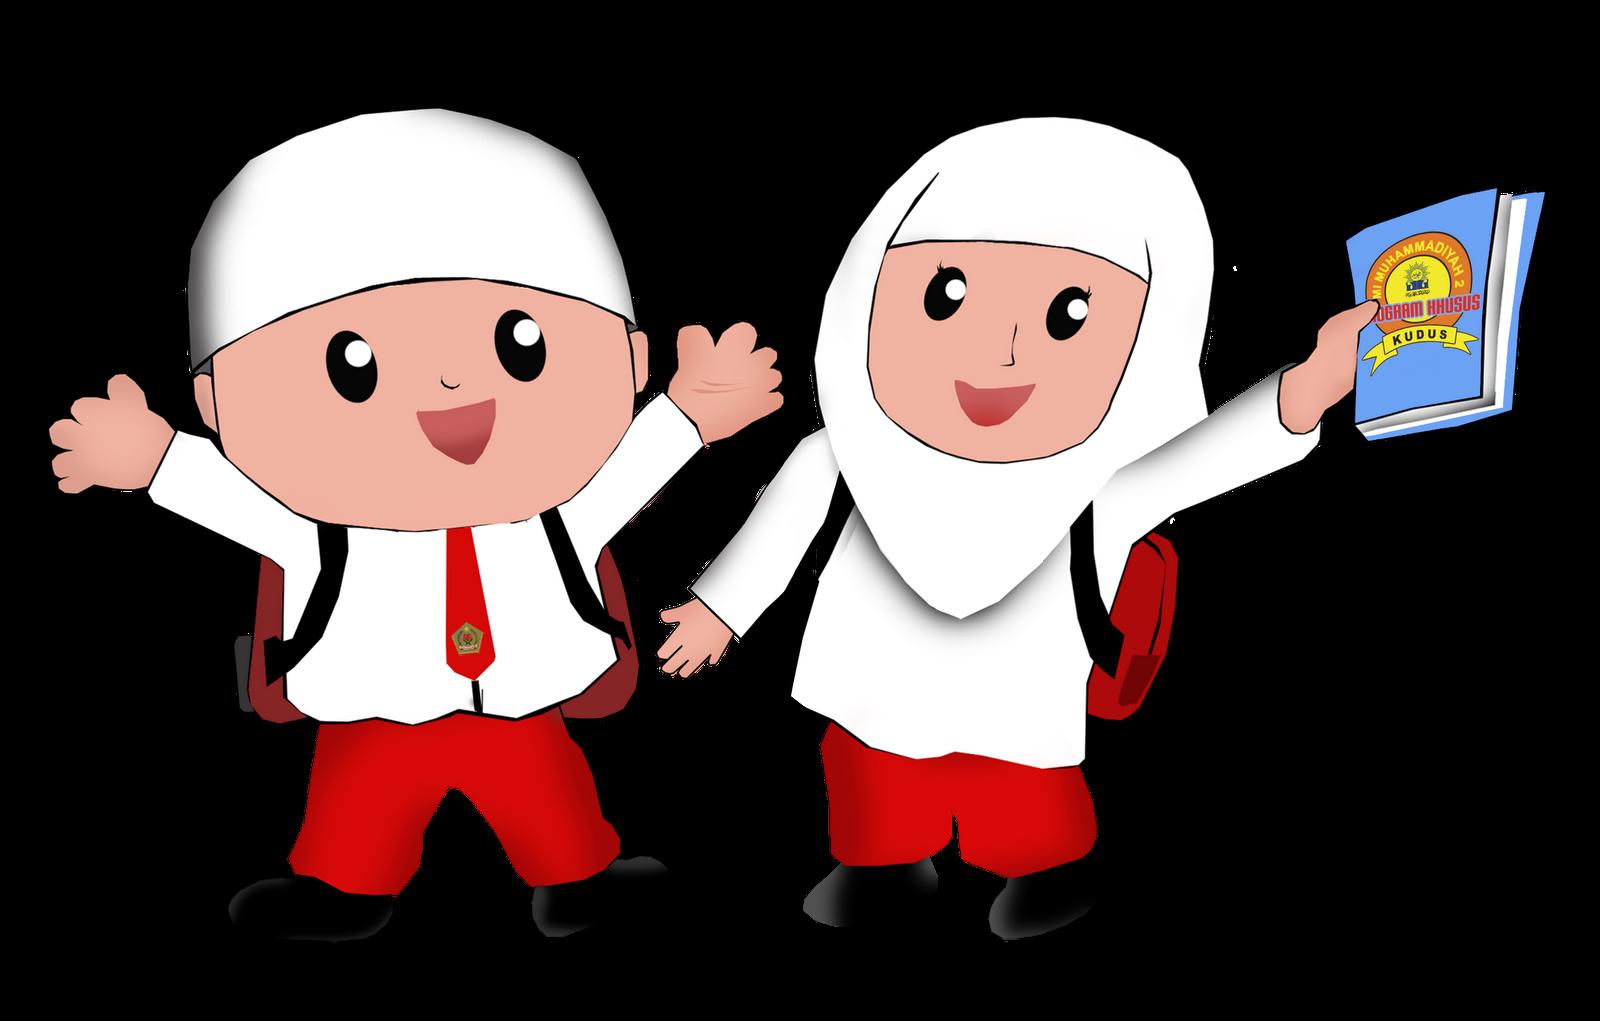 10 Gambar Kartun Islami Keren Gambar Kartun Lucu Dan Wallpaper Keren